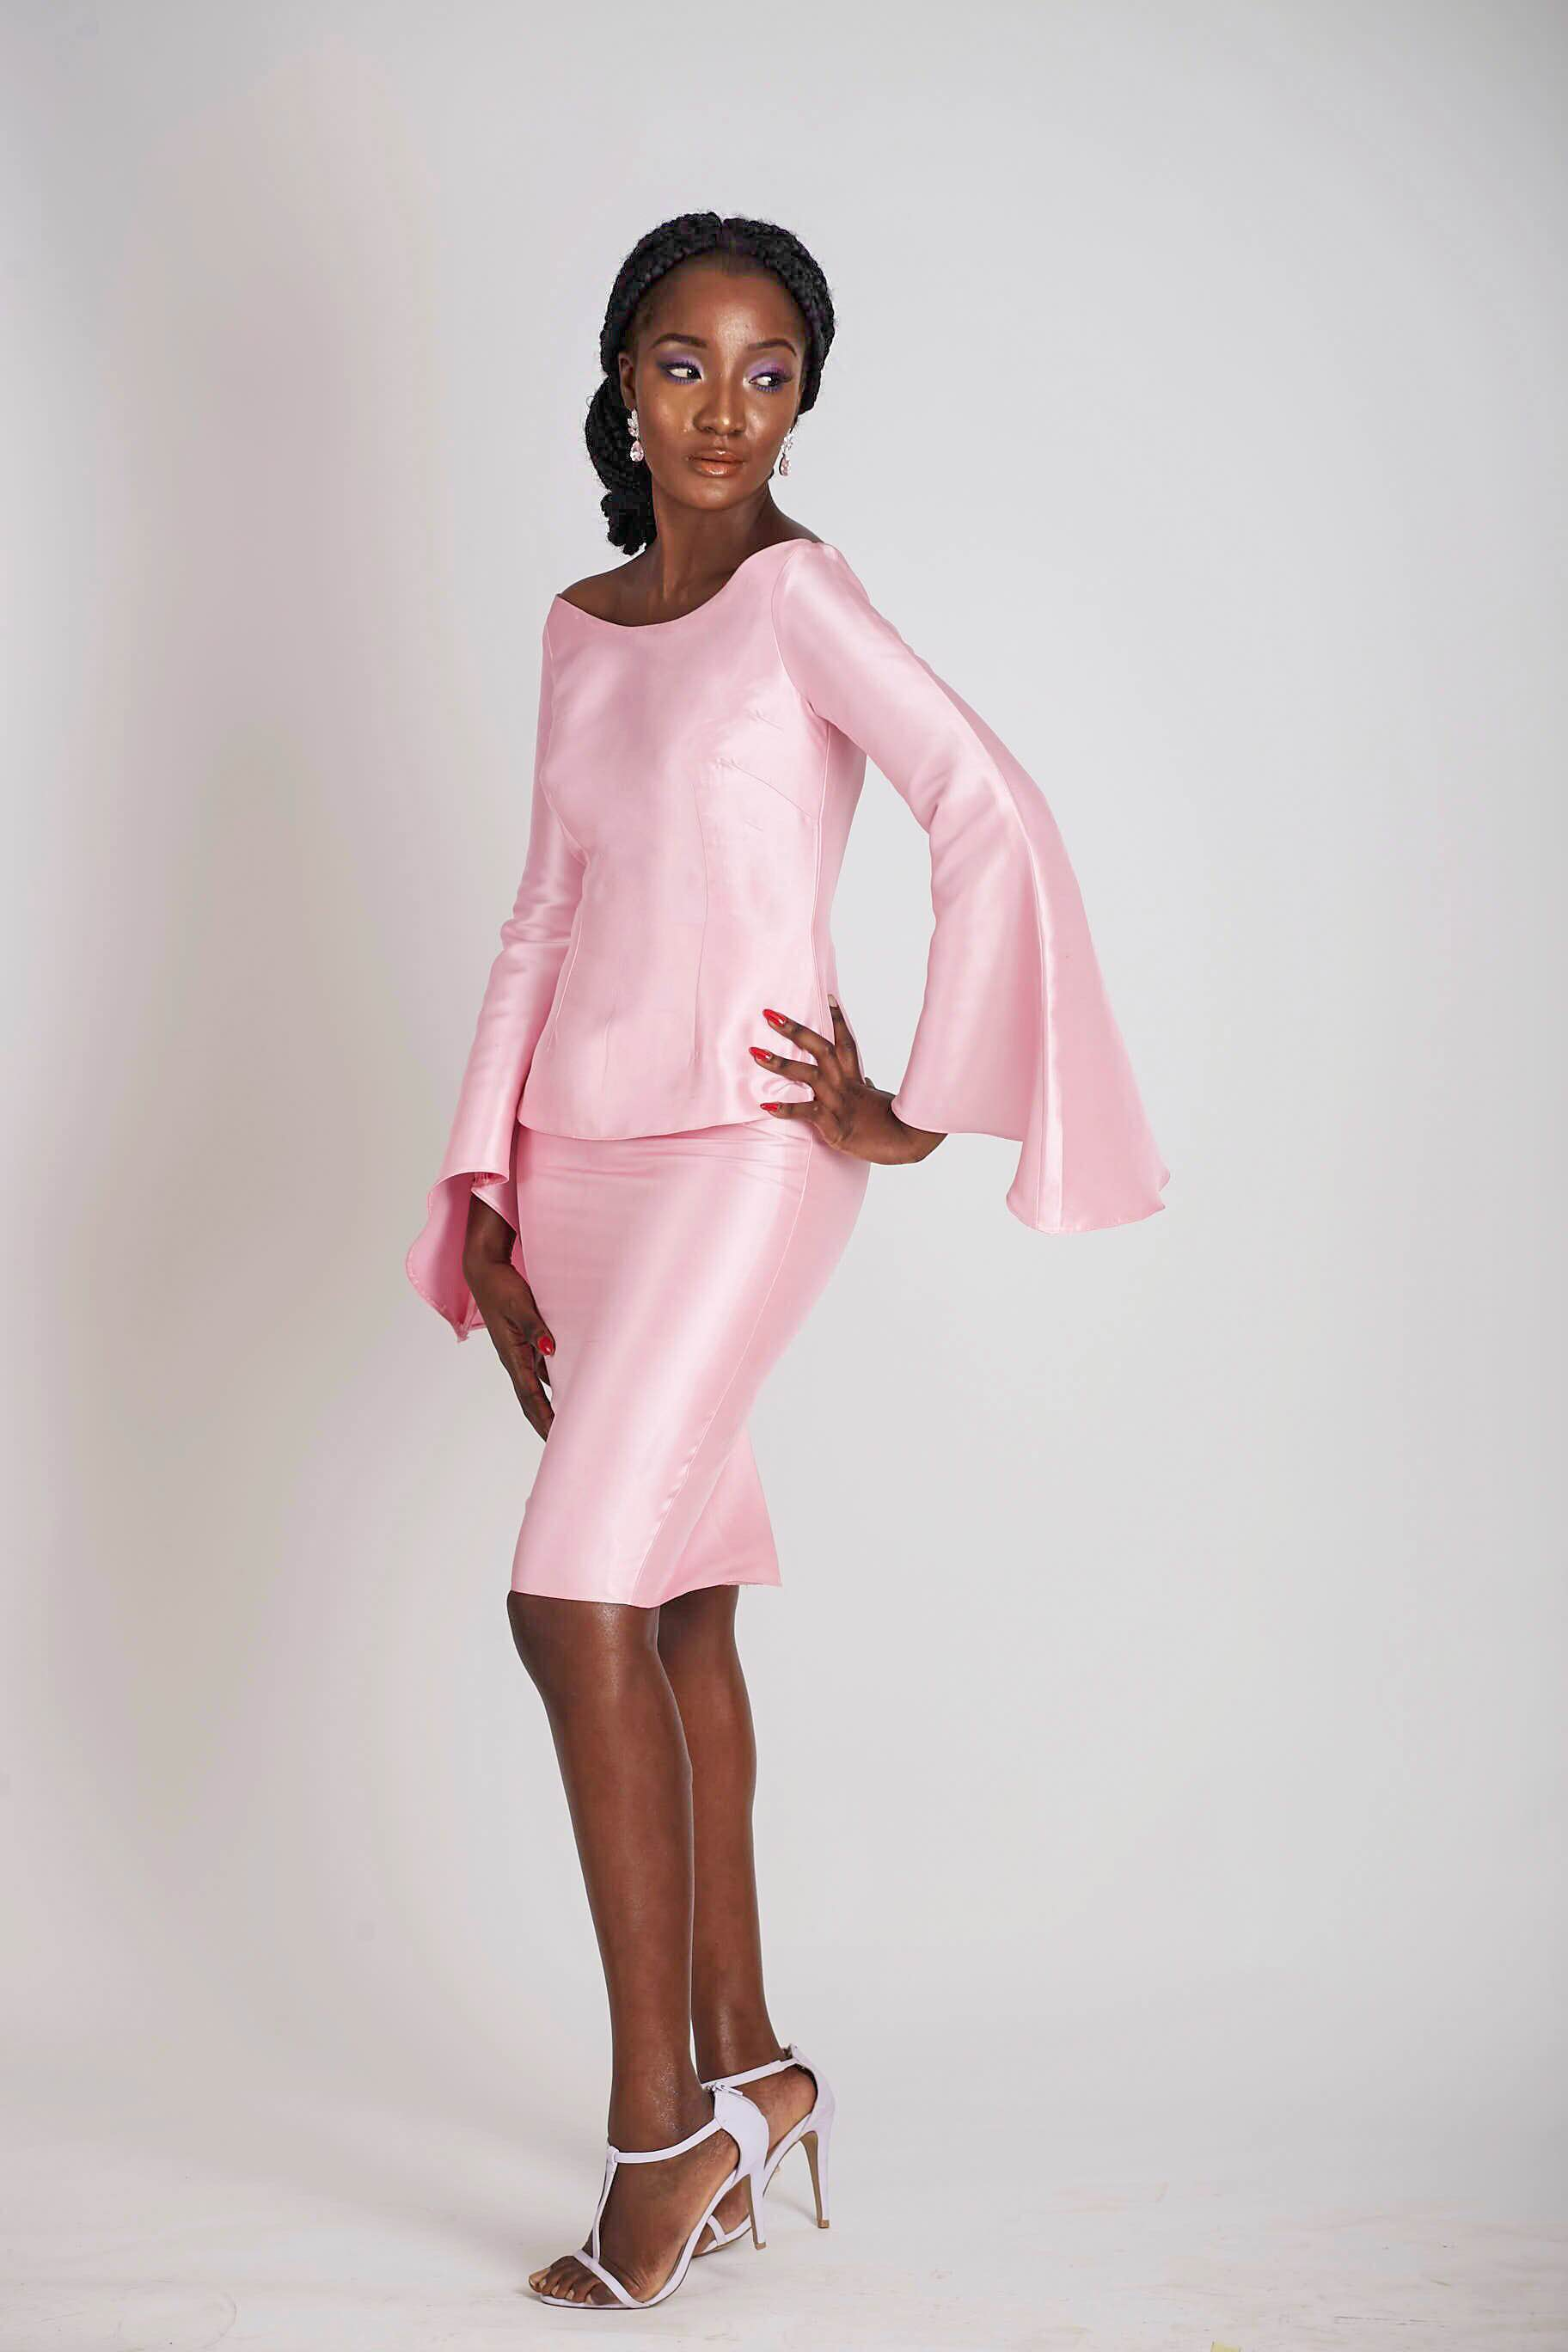 Imad Eduso - BN Style - Collection Lookbook - BellaNaija.com 08